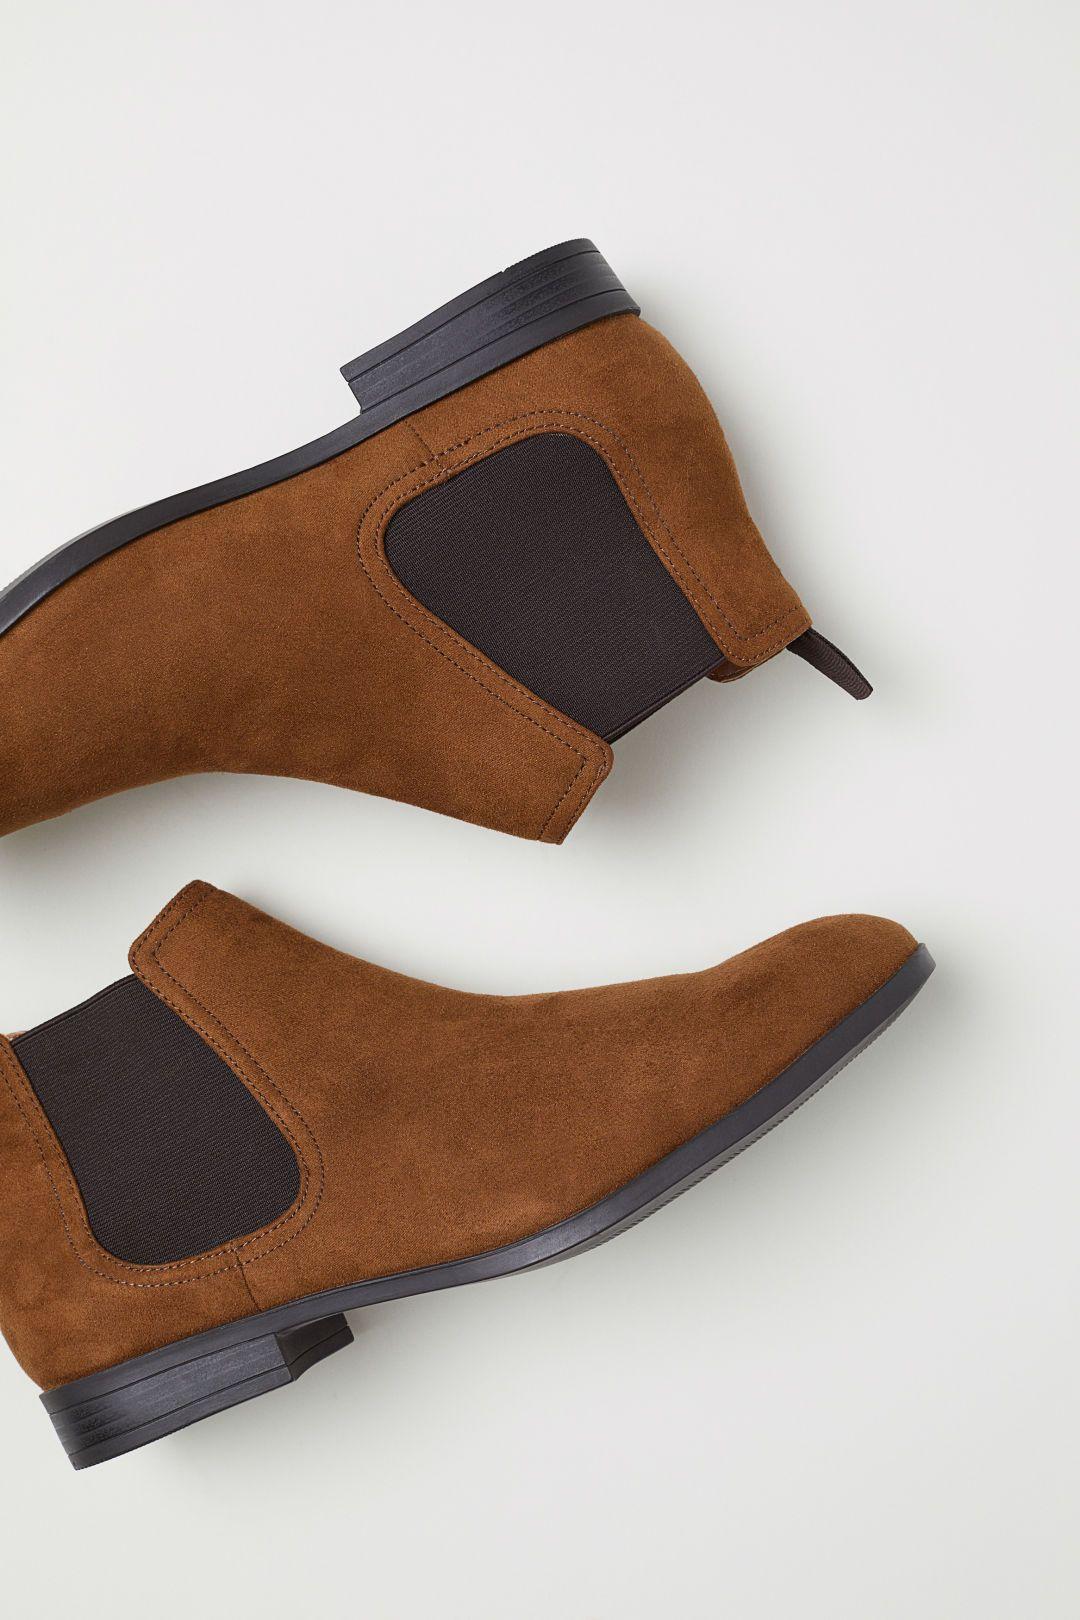 Chelsea-style Boots - Brown - Men   H\u0026M